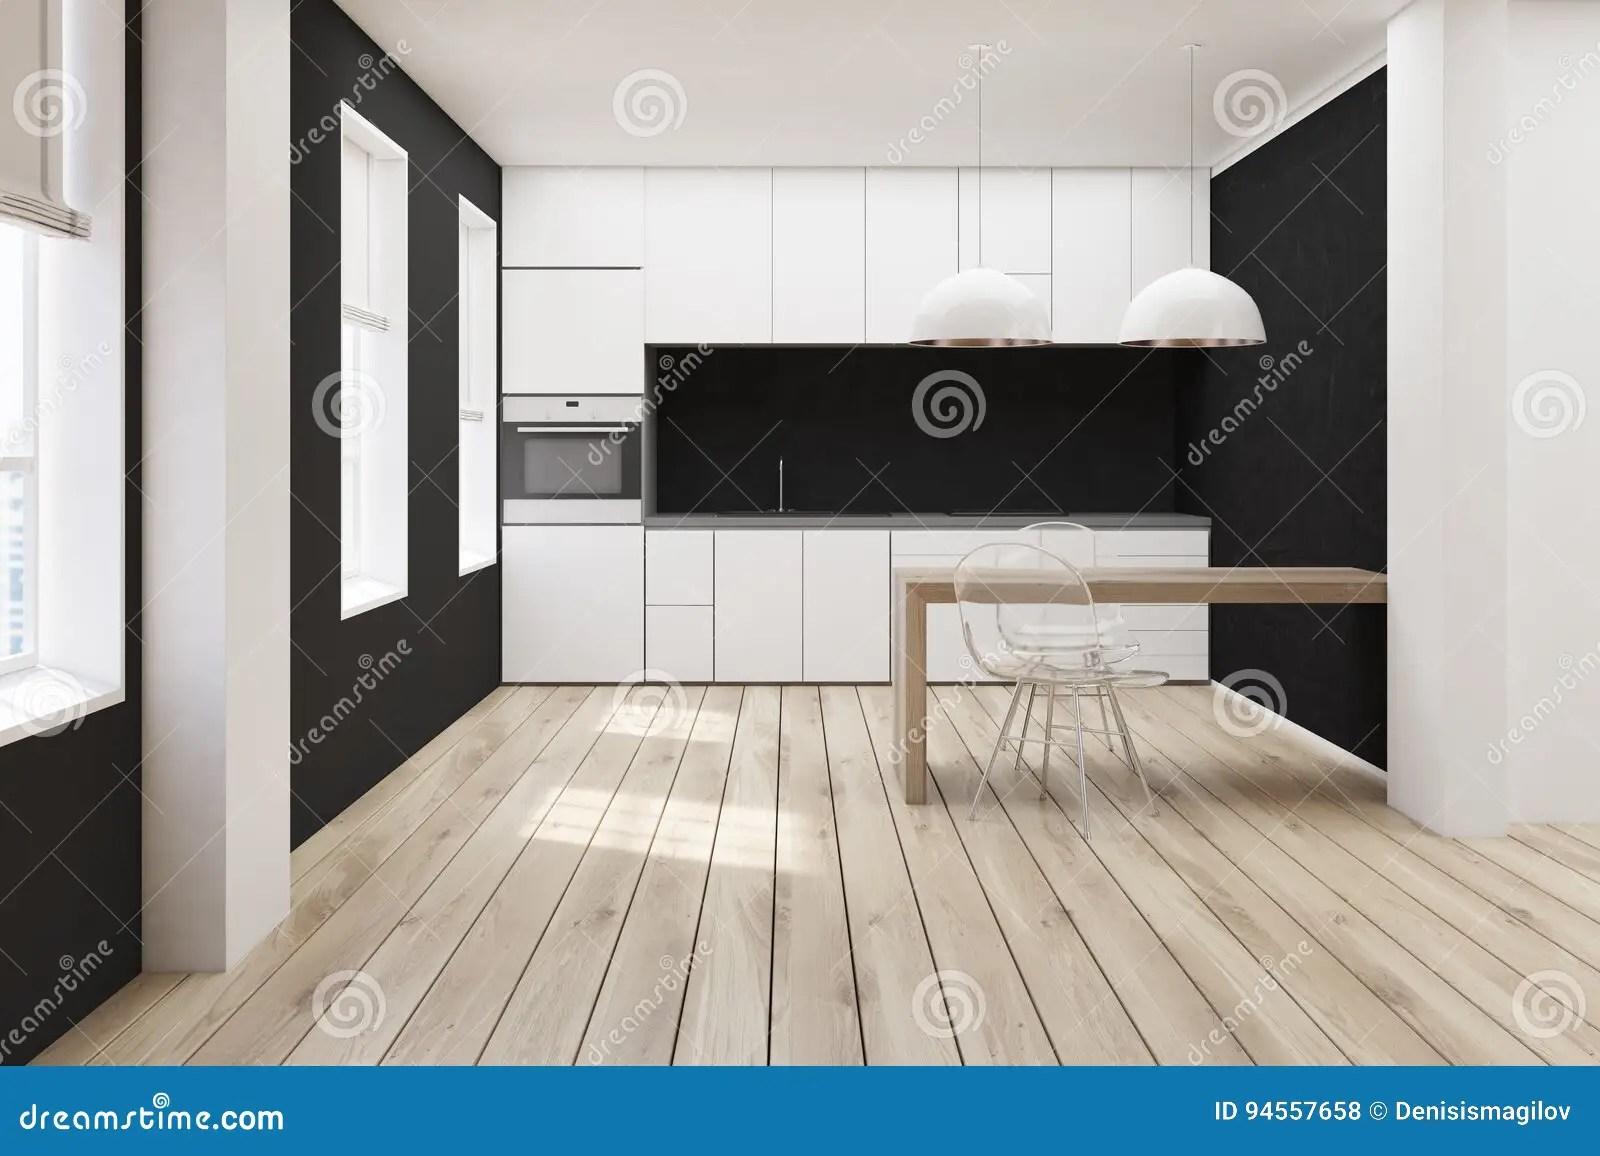 Cucina bianca piastrelle nere cucina in muratura idee per